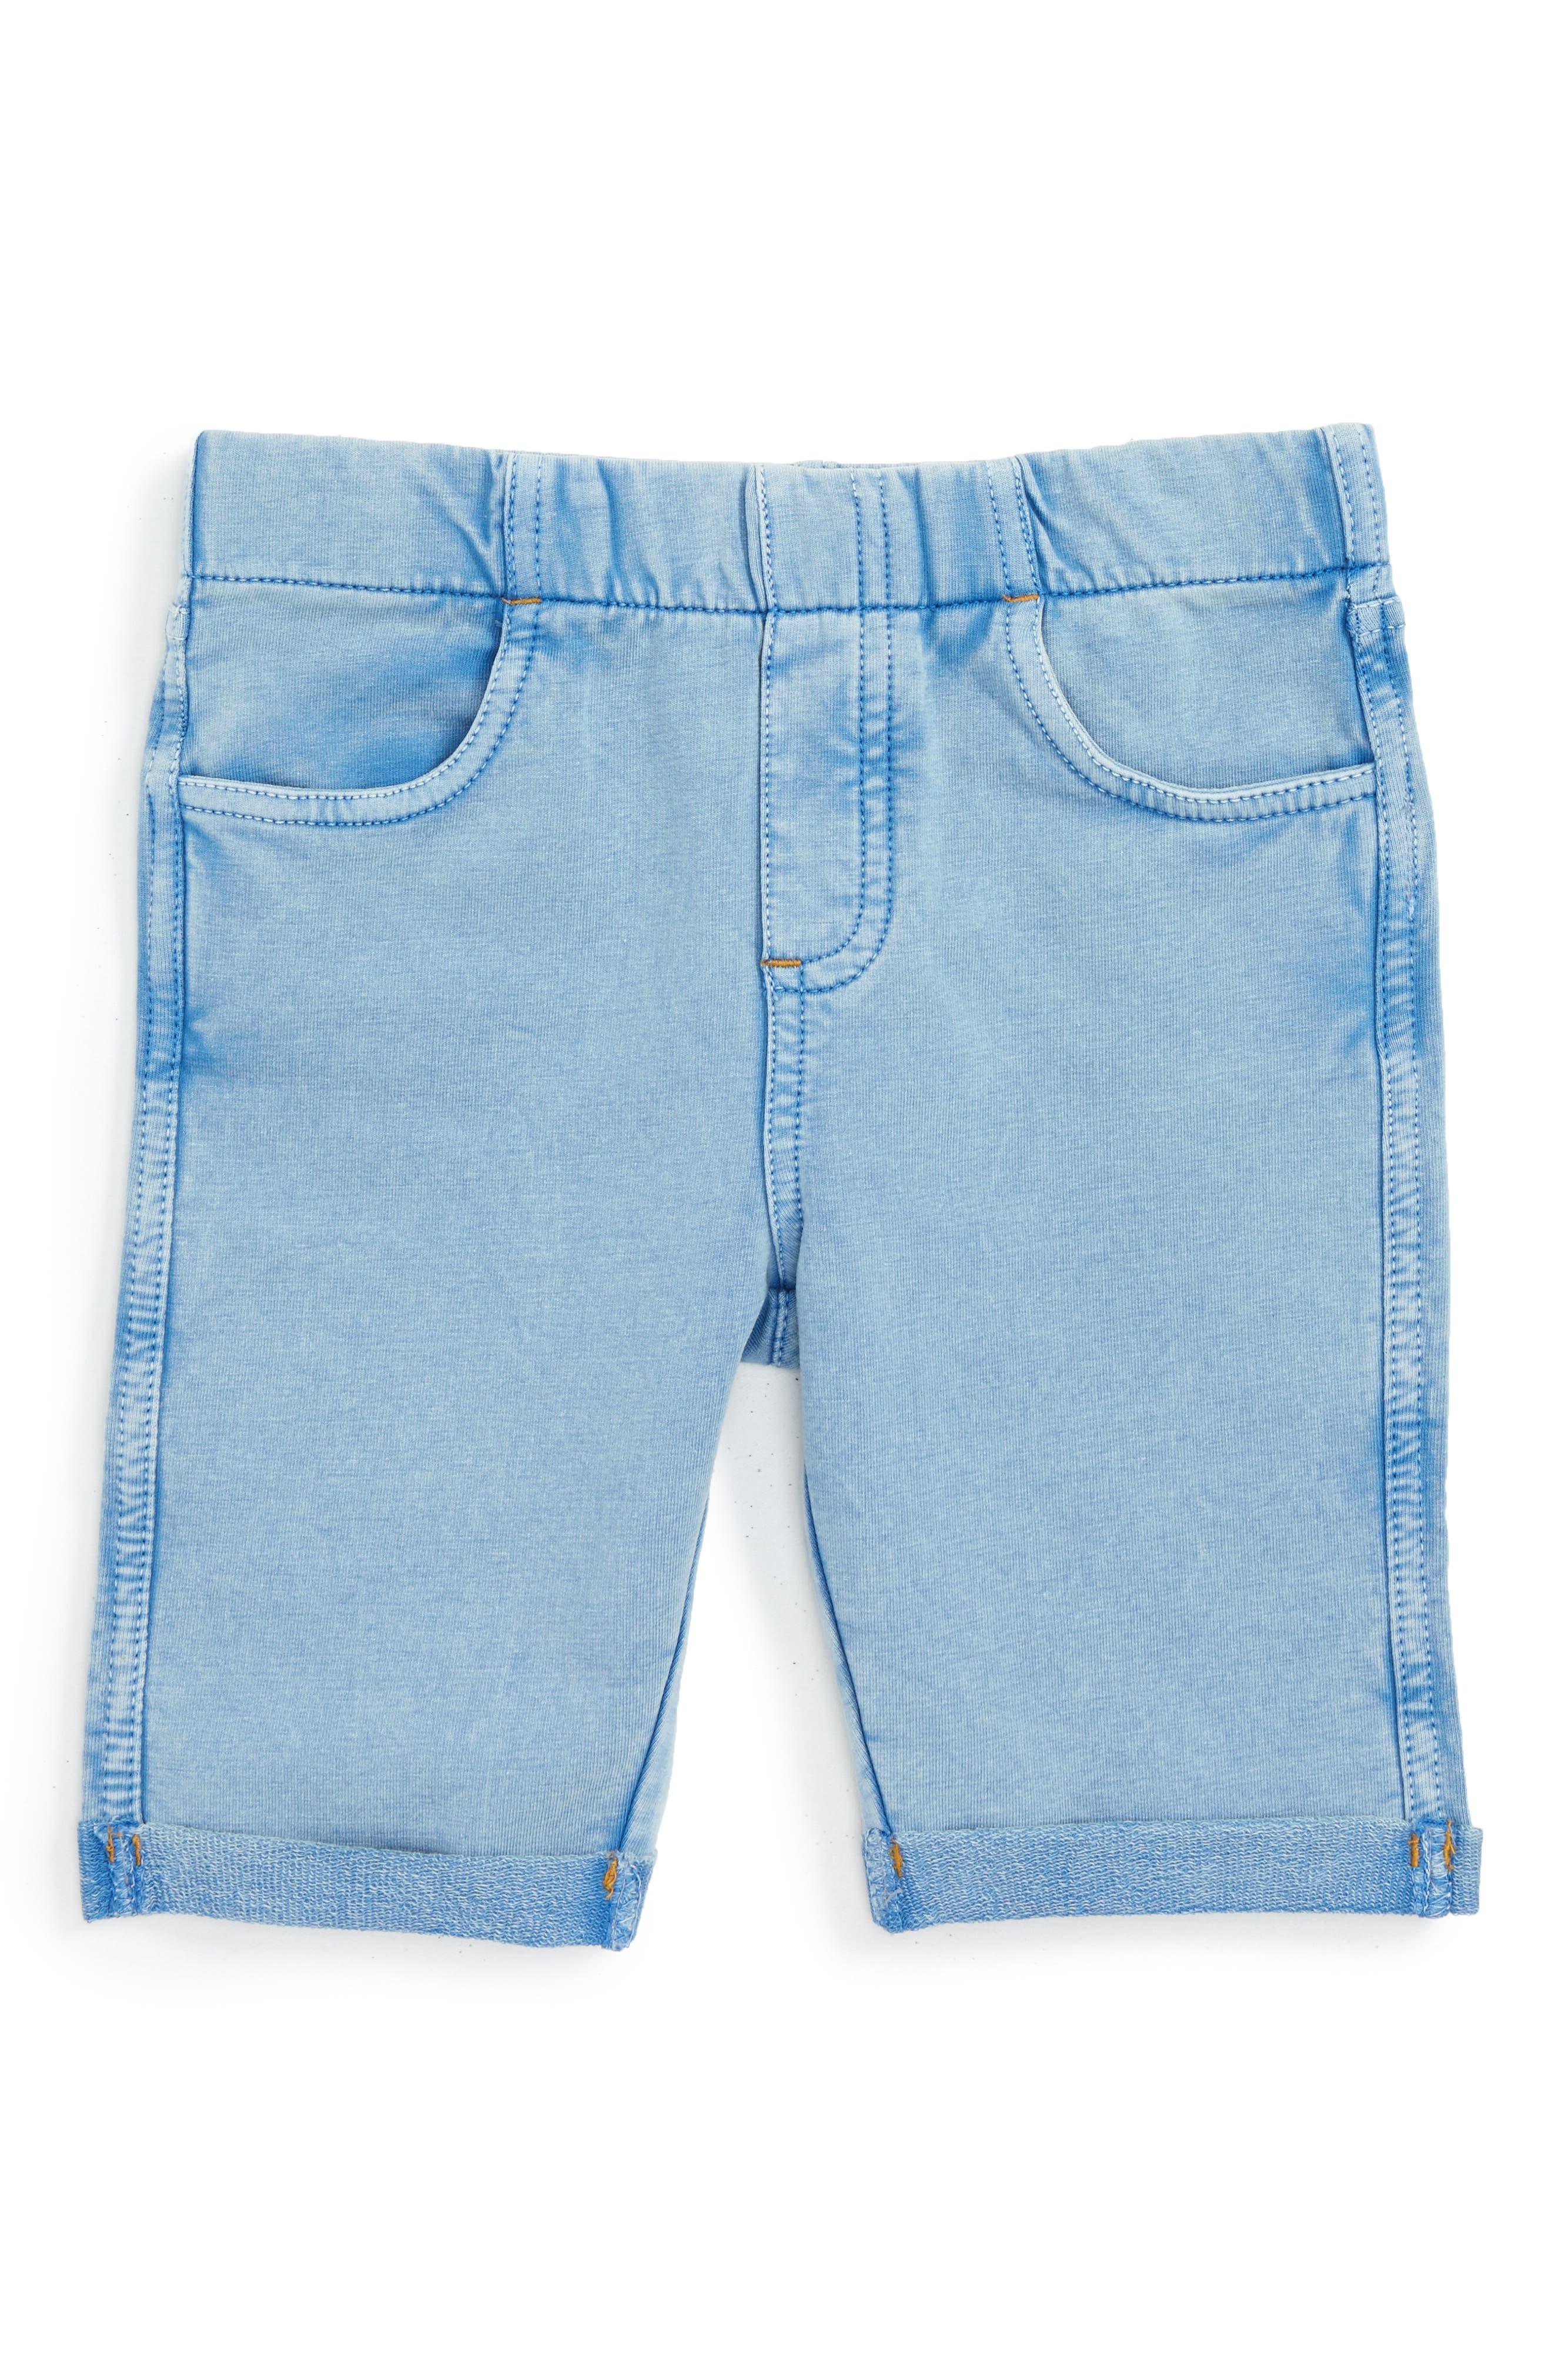 d8ff0b0d6 Kids' Shorts Apparel: T-Shirts, Jeans, Pants & Hoodies | Nordstrom